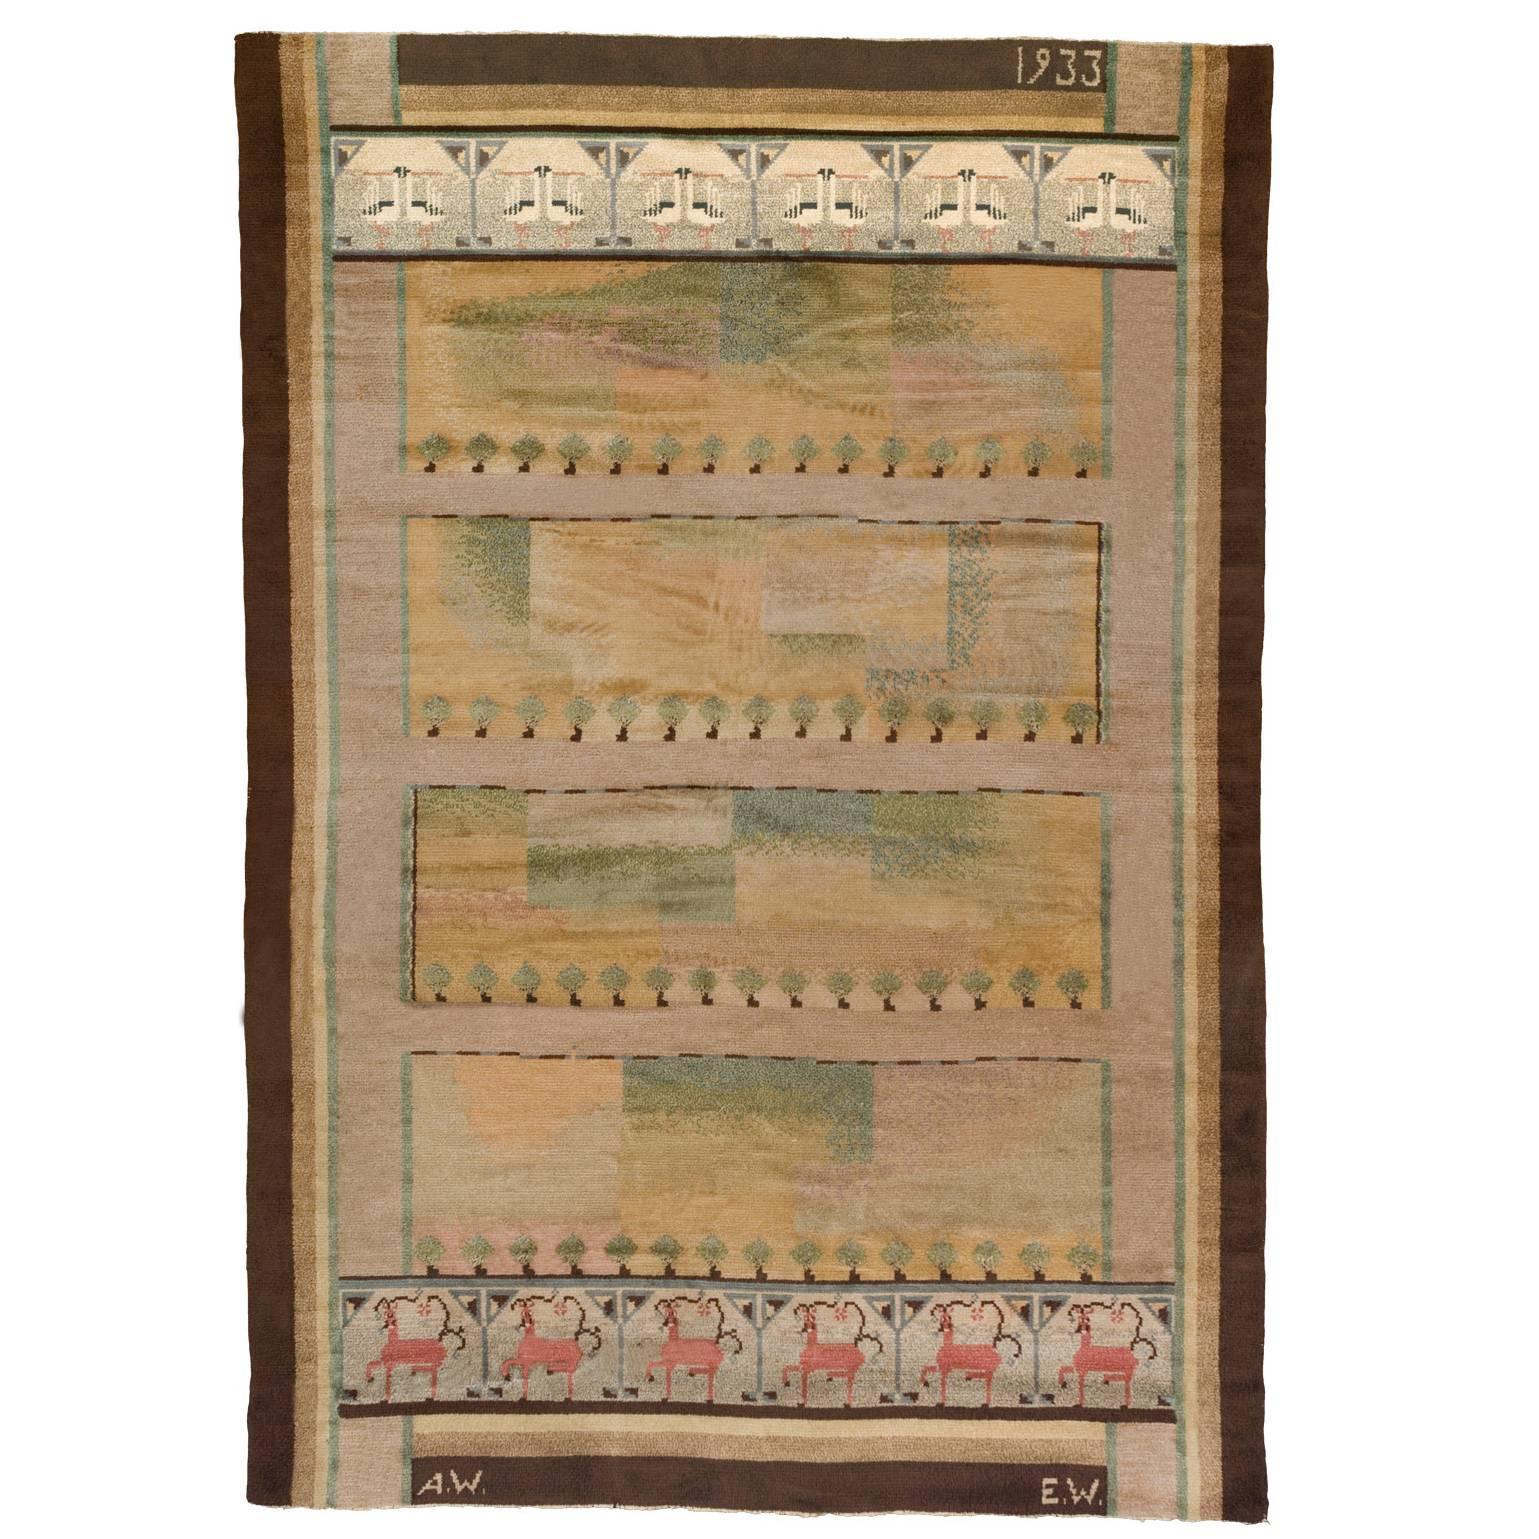 Early-20th Century Swedish Pile-Weave Carpet